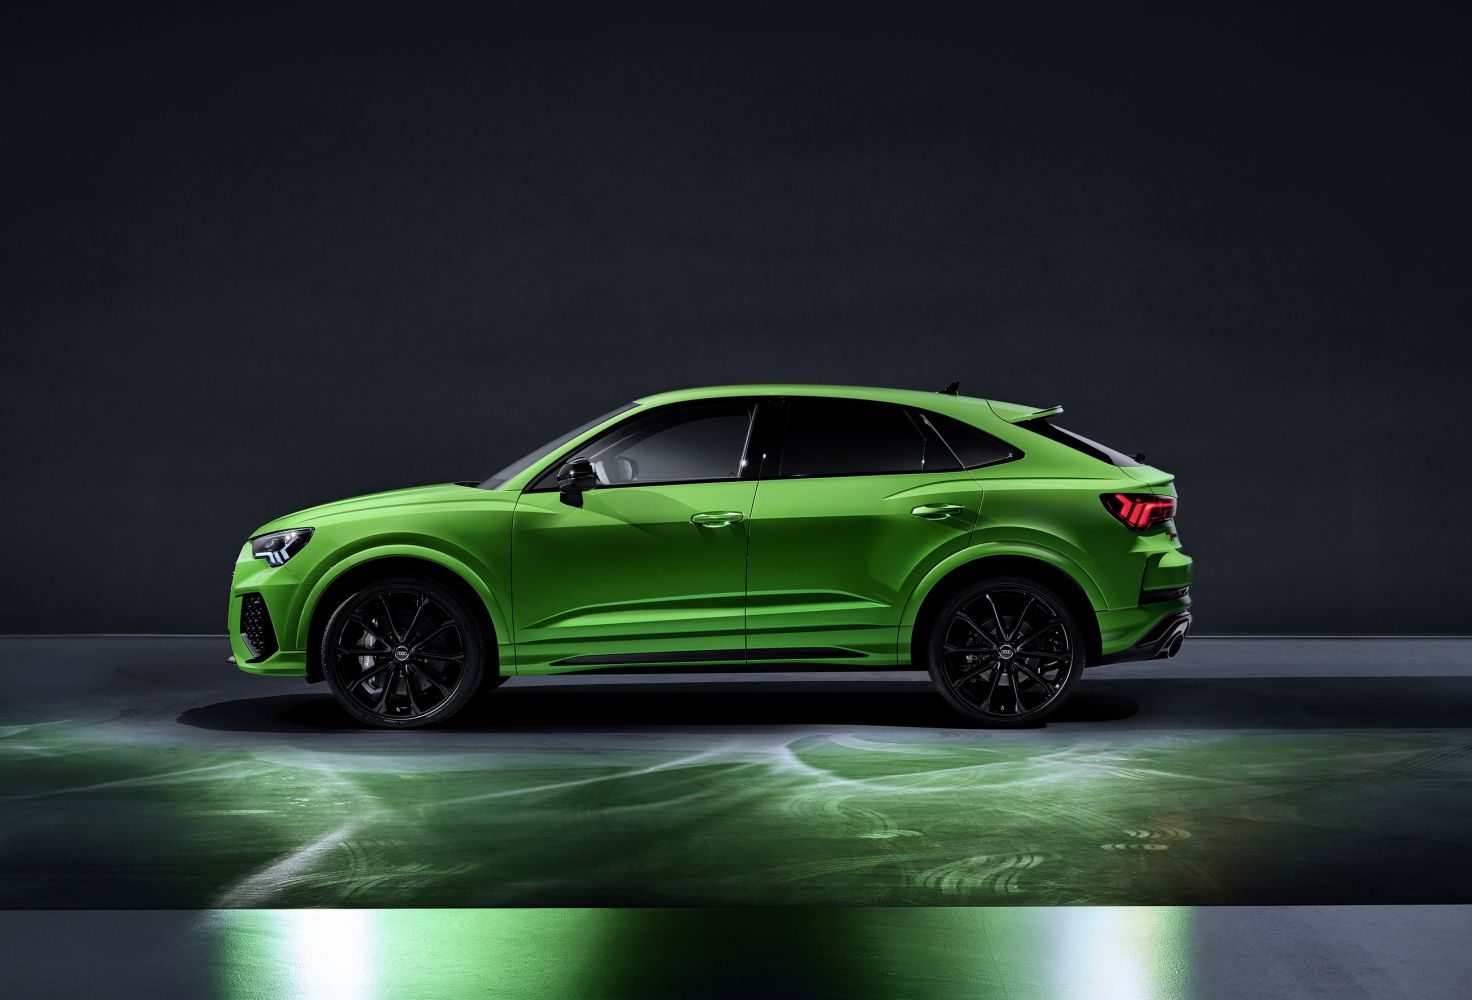 2020 Audi Rs Q3 And Rs Q3 Sportback Revealed Carconversation